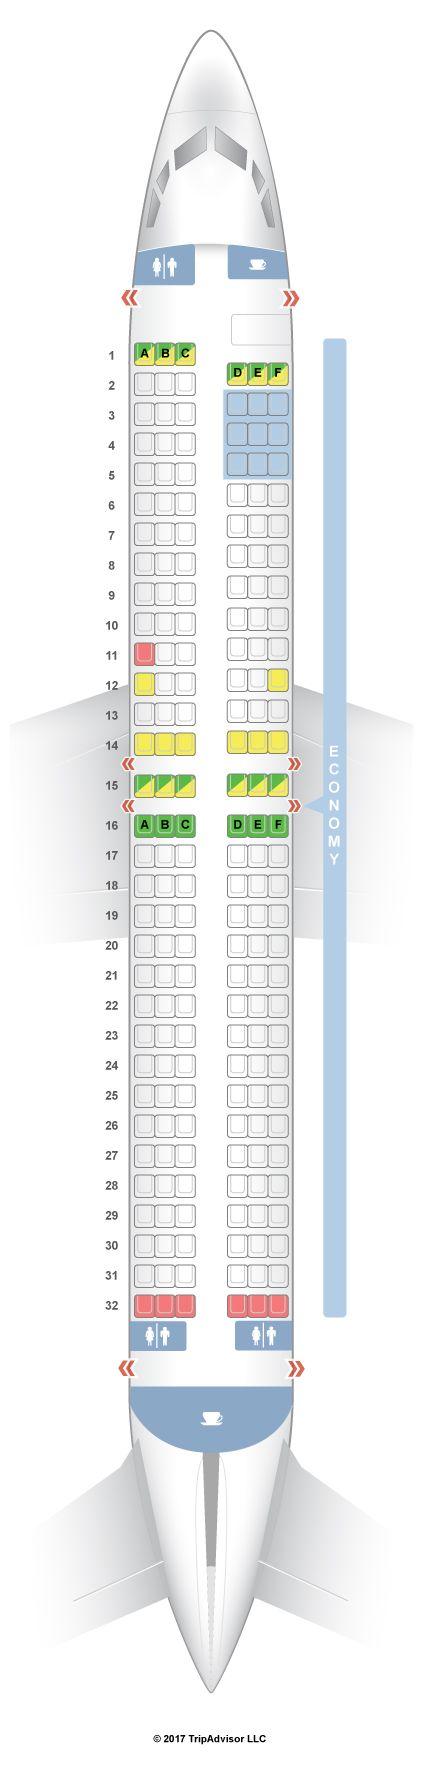 SeatGuru Seat Map Thomson Boeing 737-800 (738) - SeatGuru